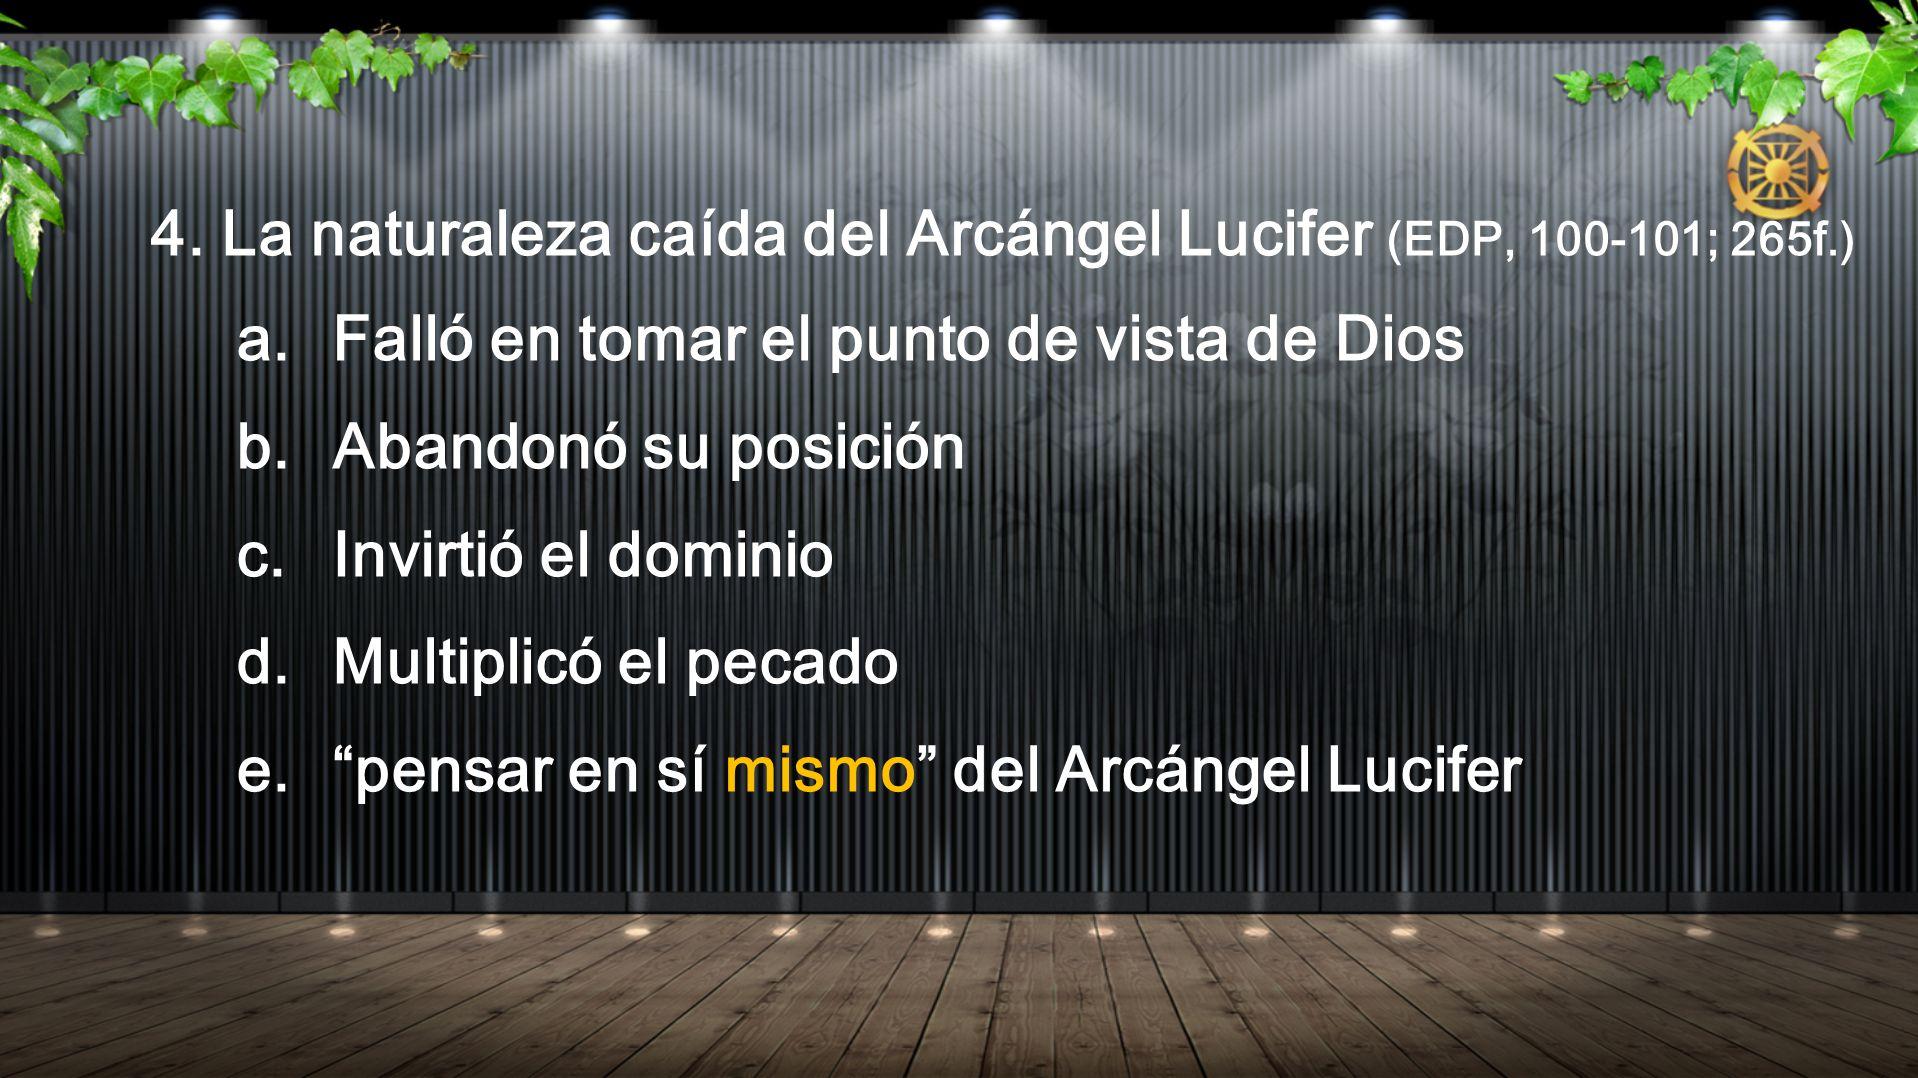 4. La naturaleza caída del Arcángel Lucifer (EDP, 100-101; 265f.) a. Falló en tomar el punto de vista de Dios b. Abandonó su posición c. Invirtió el d